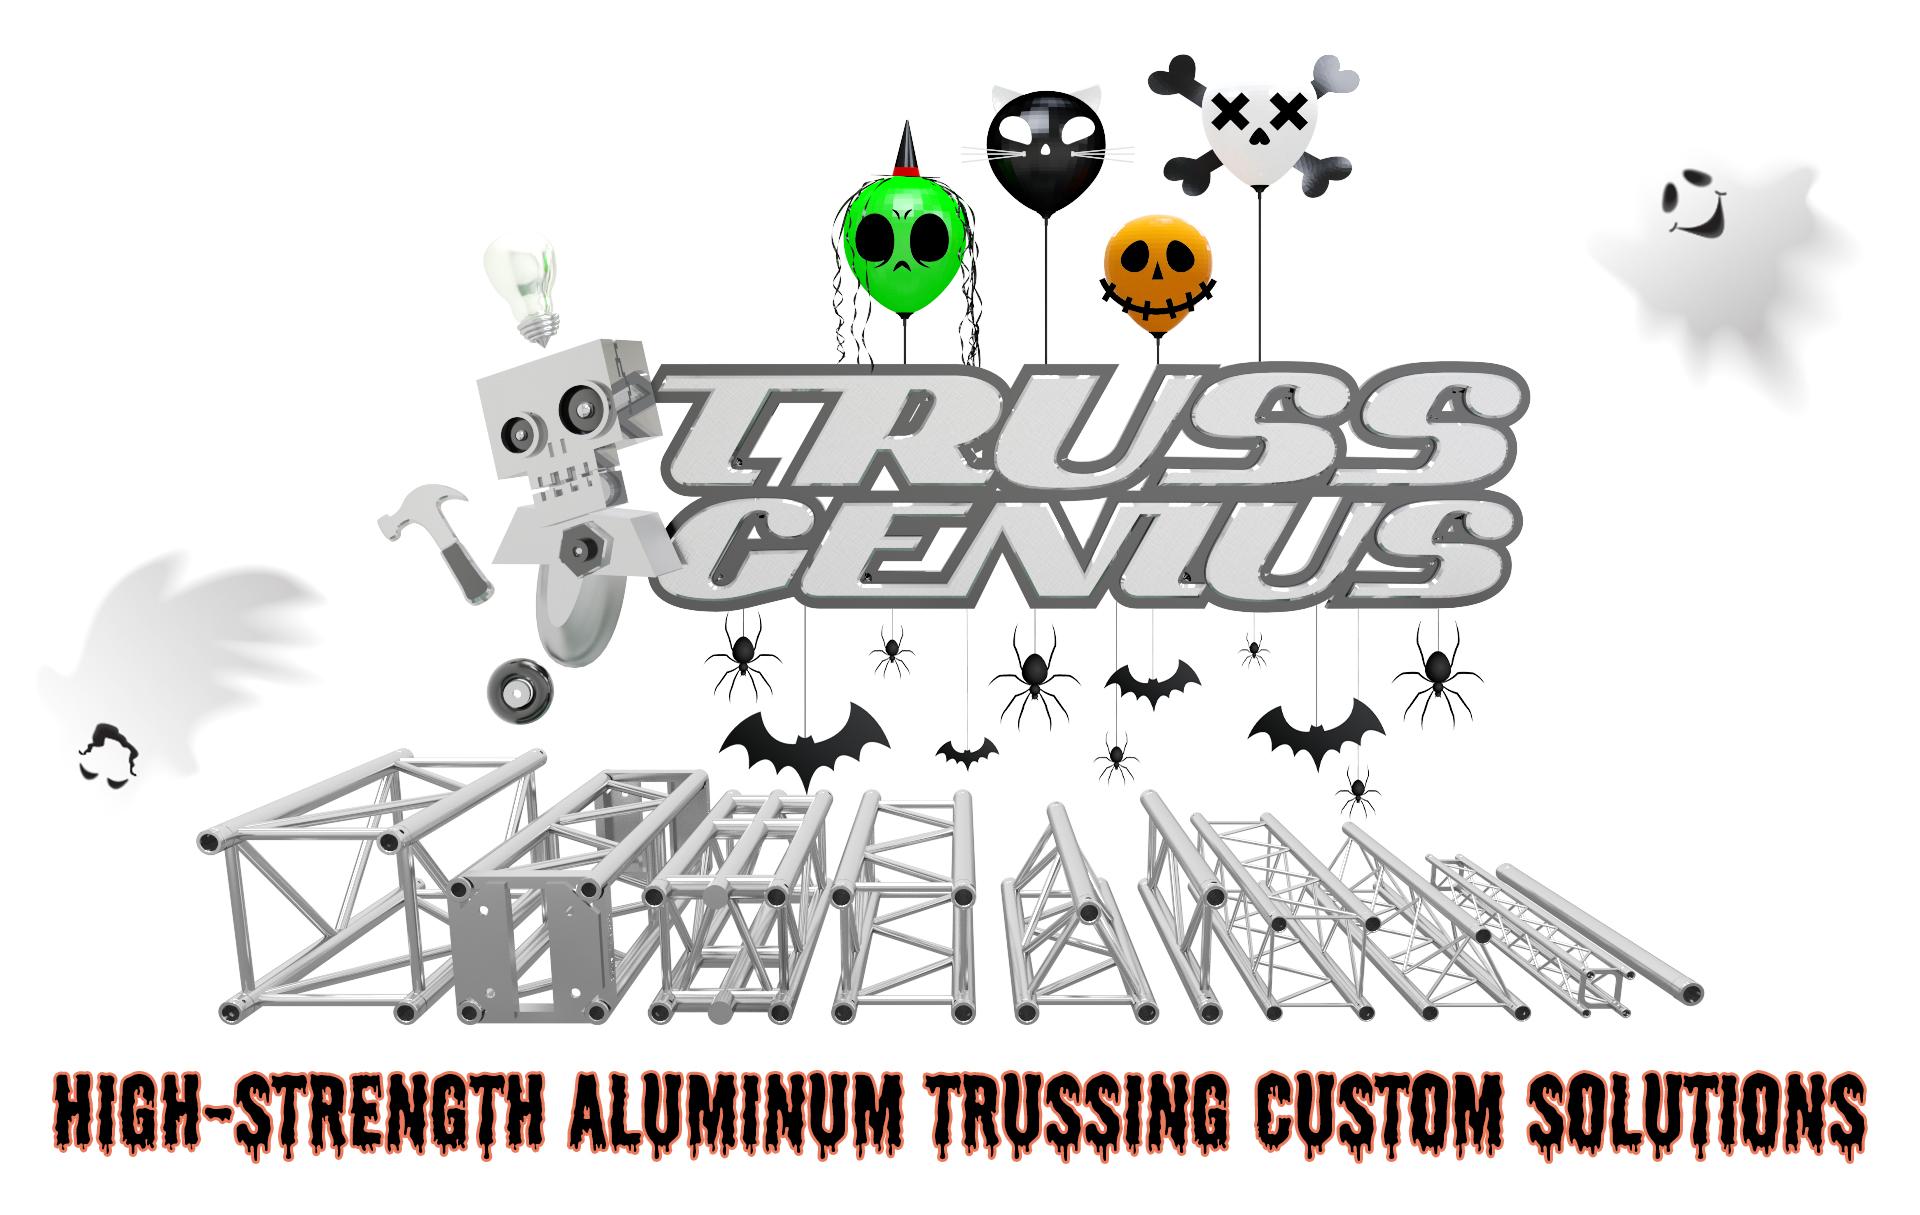 Truss Genius | Aluminum Truss For Trade Show Exhibits and Entertainment Applications